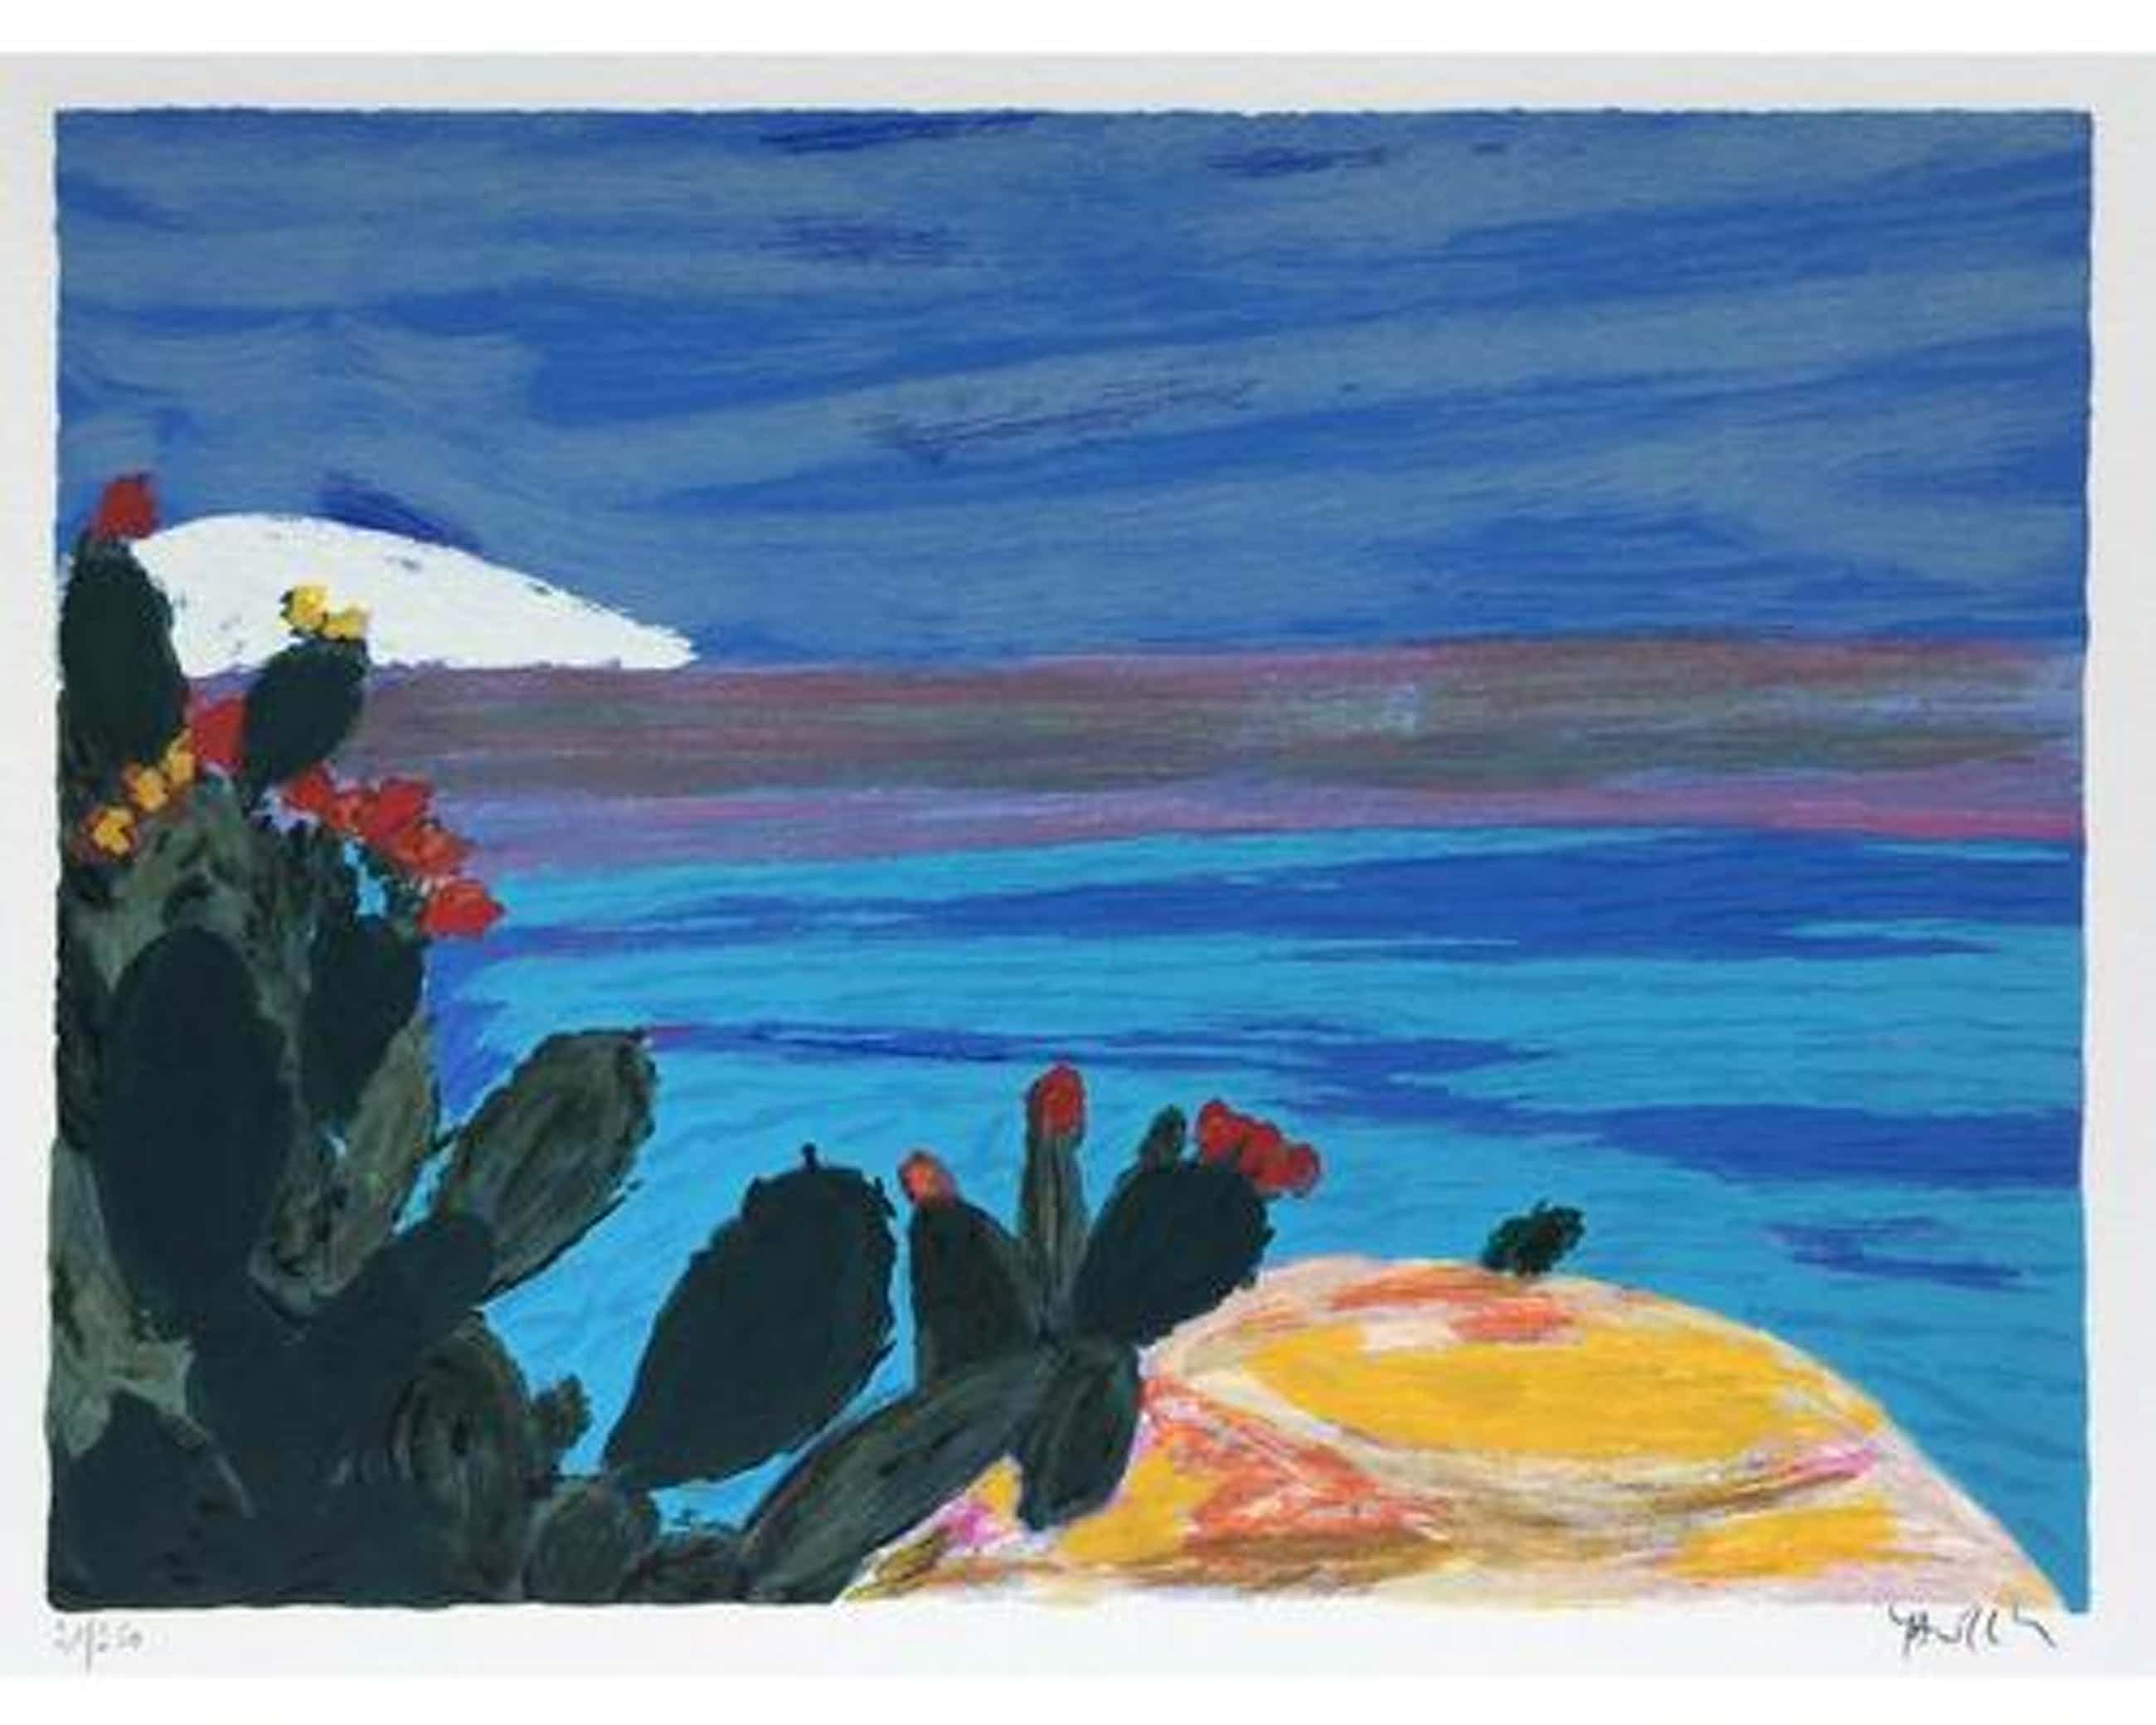 "Amos Yaskil - Amos Yaskil, Landschaft, Originalgrafik-Aus meinem Atelier"" kopen? Bied vanaf 175!"